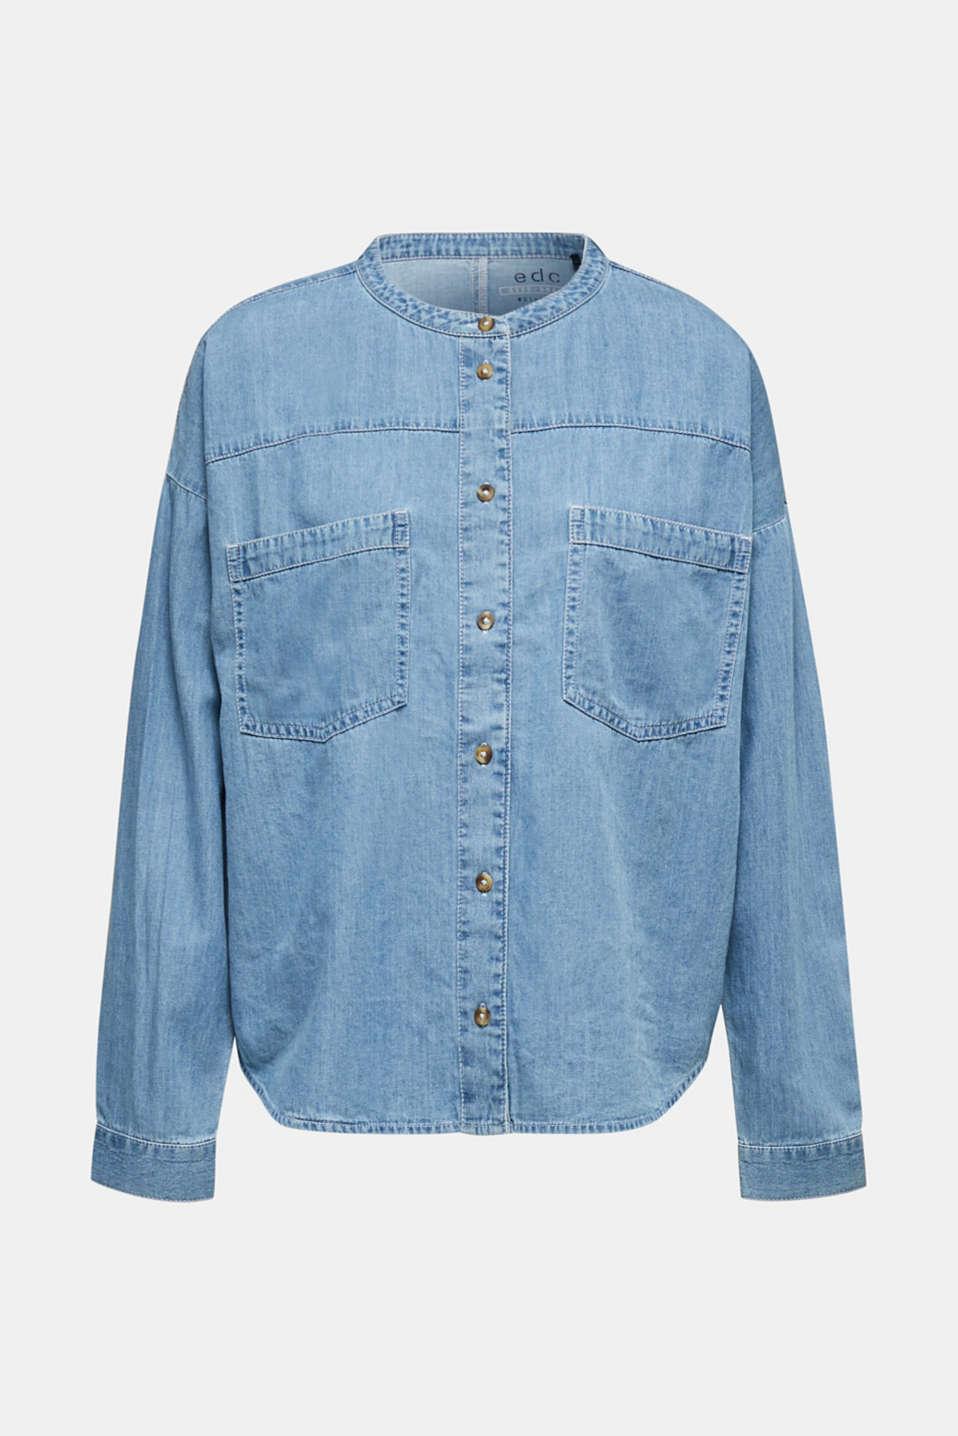 Collarless denim blouse, 100% cotton, BLUE LIGHT WASH, detail image number 7